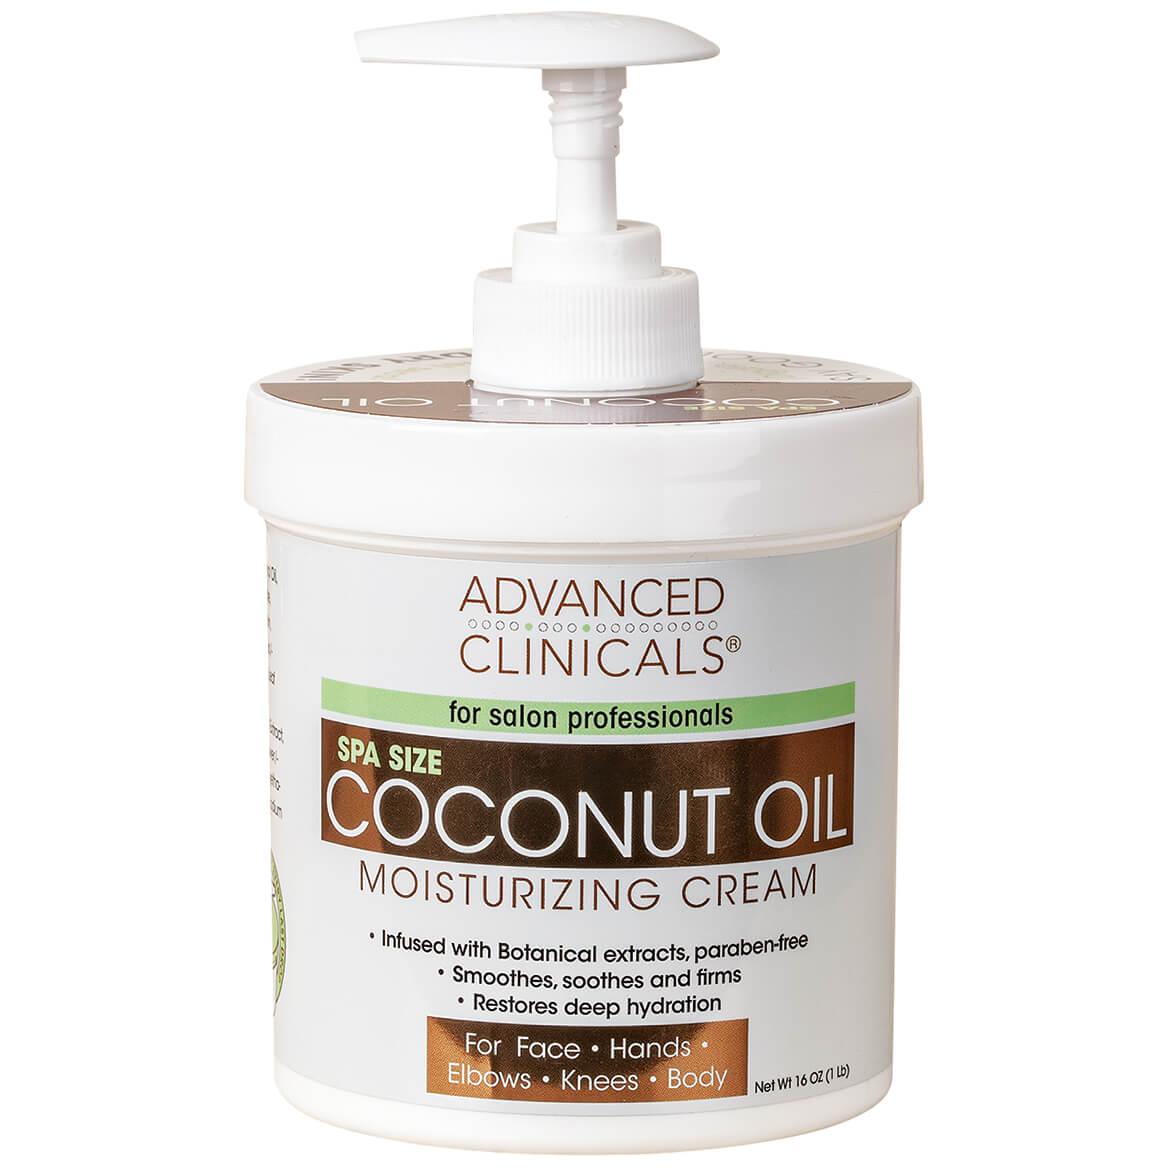 Advanced Clinicals® Coconut Oil Moisturizing Cream-368953